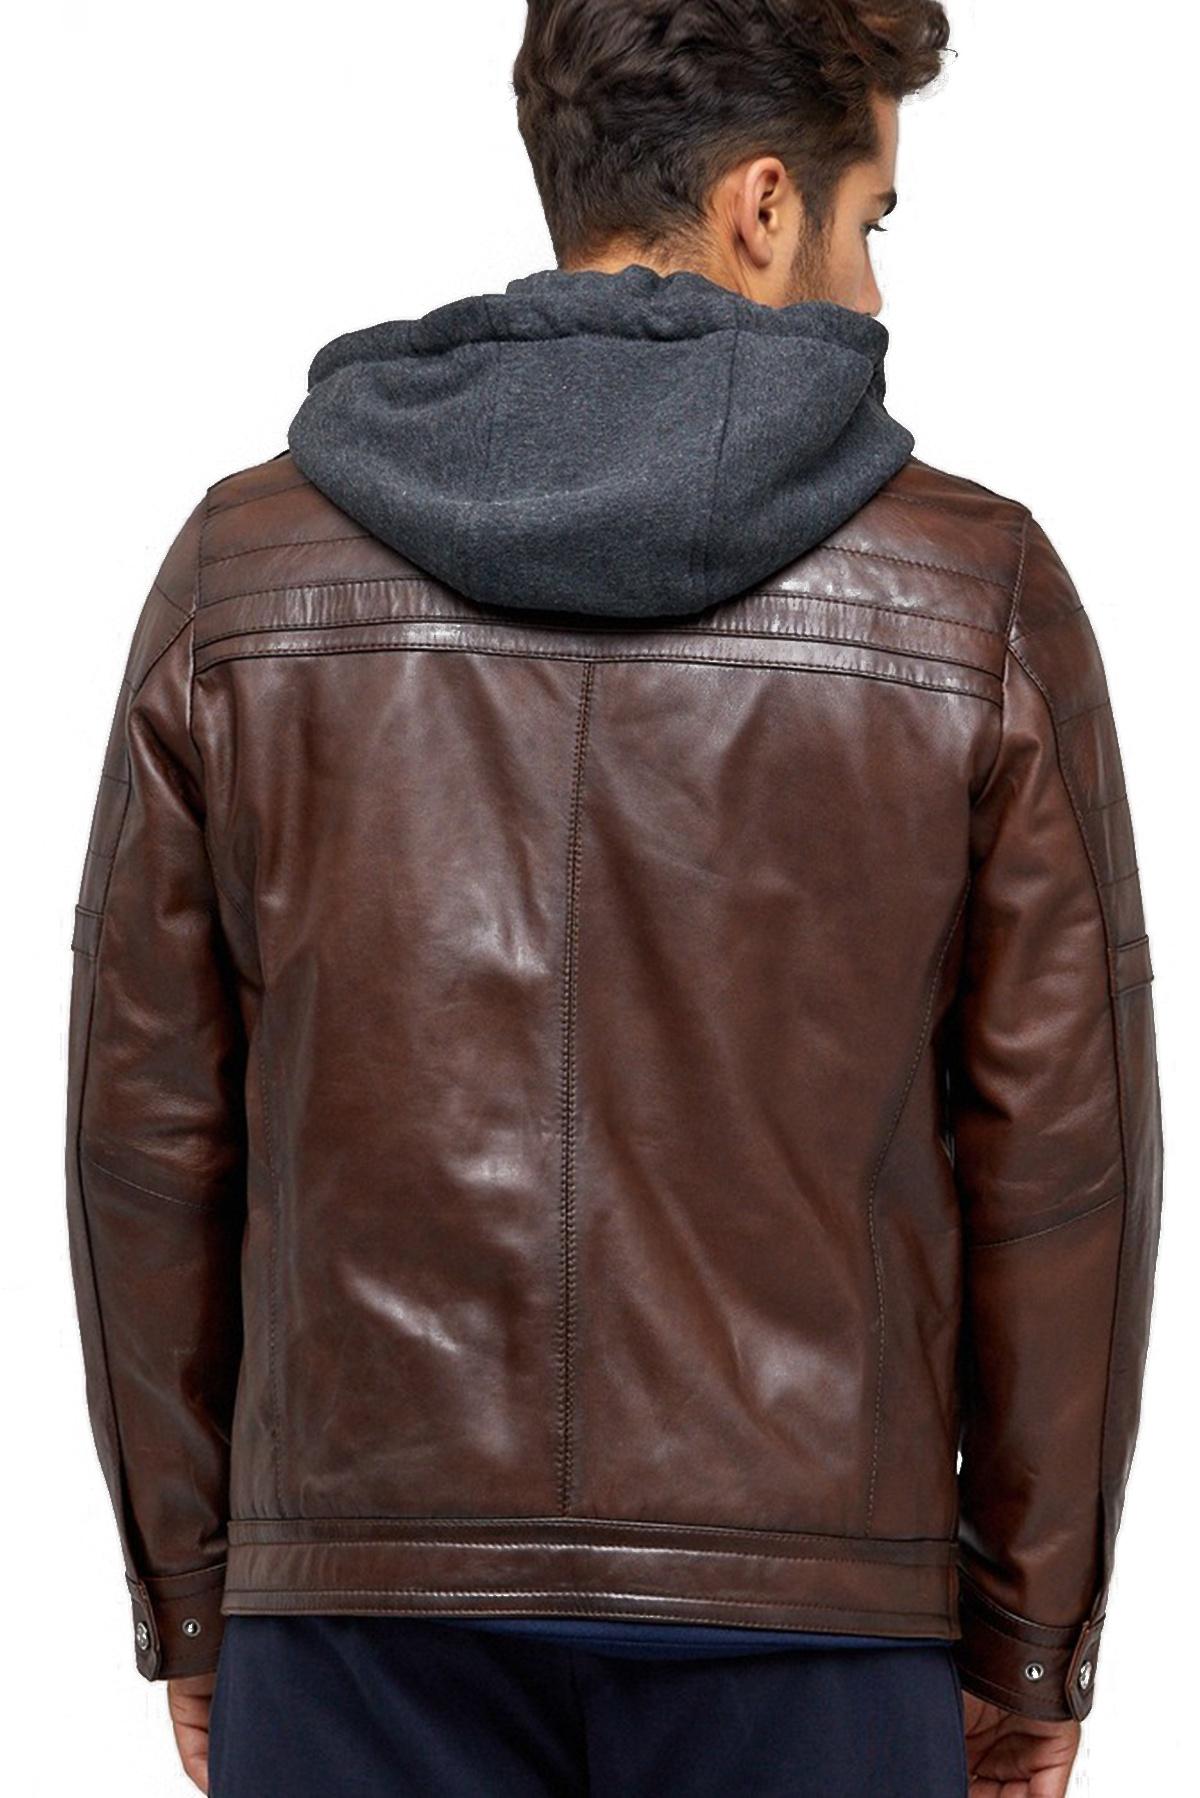 best men's leather jacket